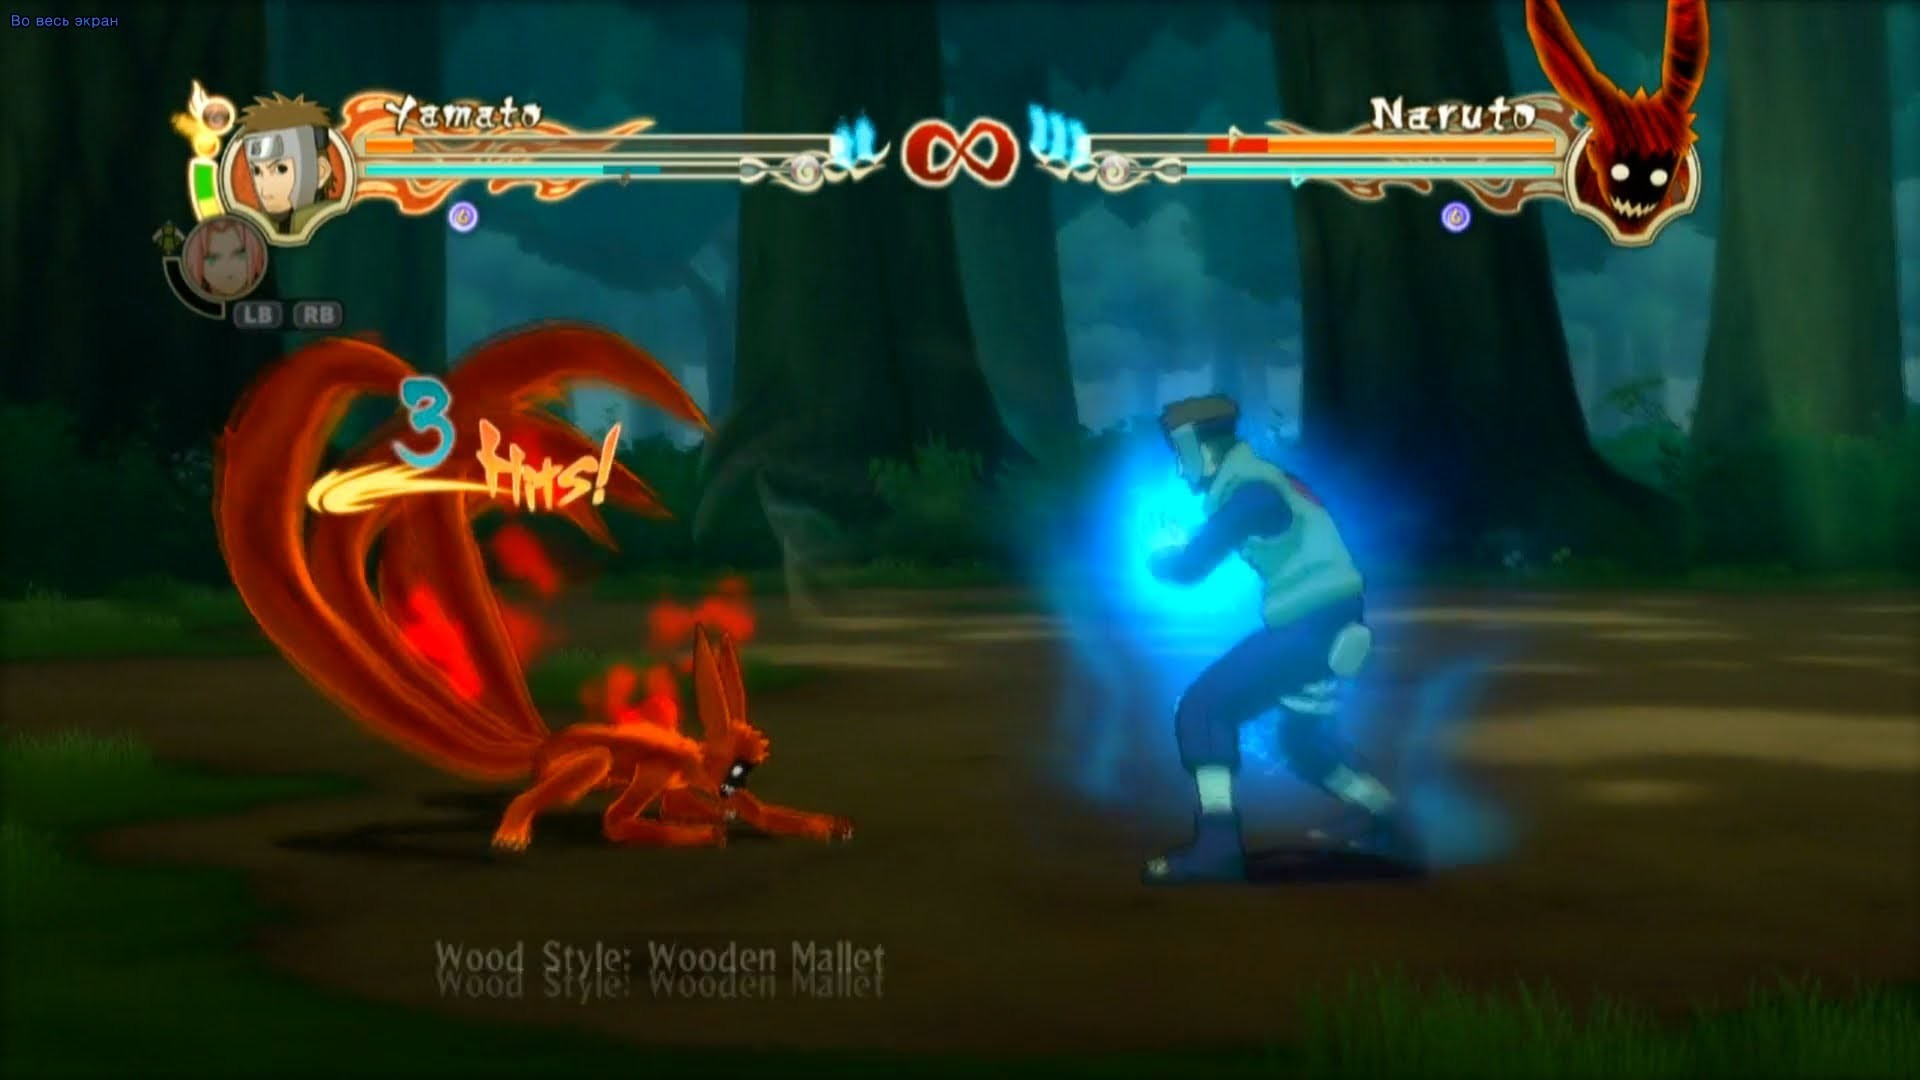 Naruto Shippuden: Ultimate Ninja Storm 2 [HD] – Yamato Vs Naruto Nine Tails